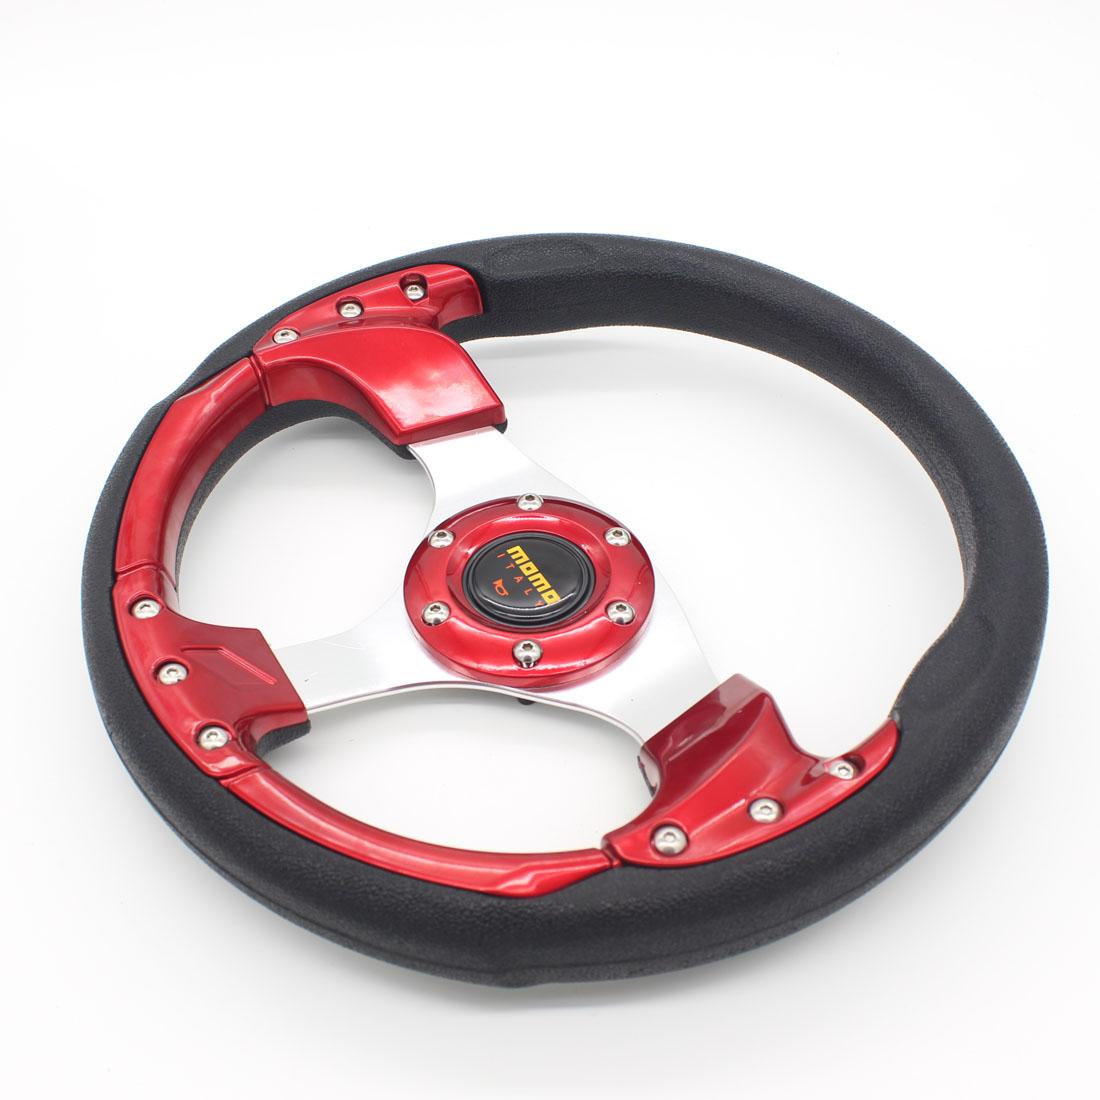 "Dongzhen 12.4"" MOMO PU Steering Wheel 320MM MOMO Steering Wheel PU MOMO Sport Steering Wheel Racing Car Steering Wheel(China (Mainland))"